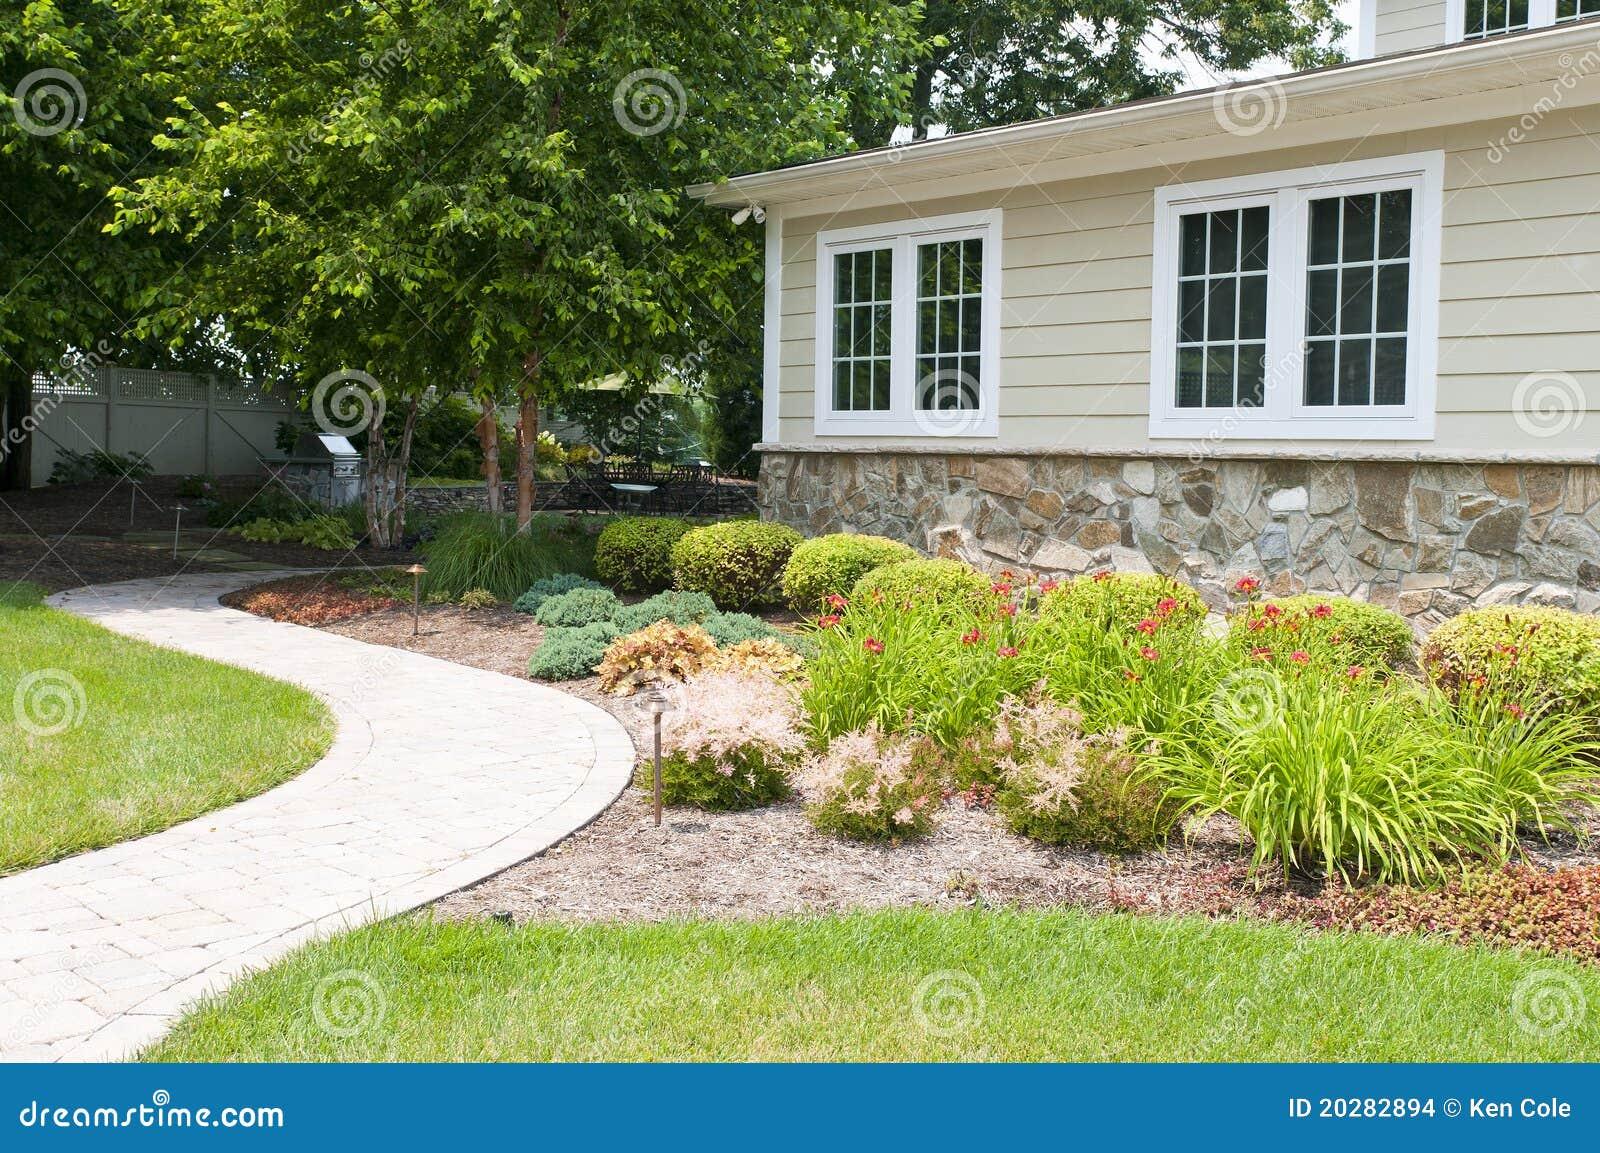 Suburban Backyard Design : Backyard Landscaping Stock Images  Image 20282894